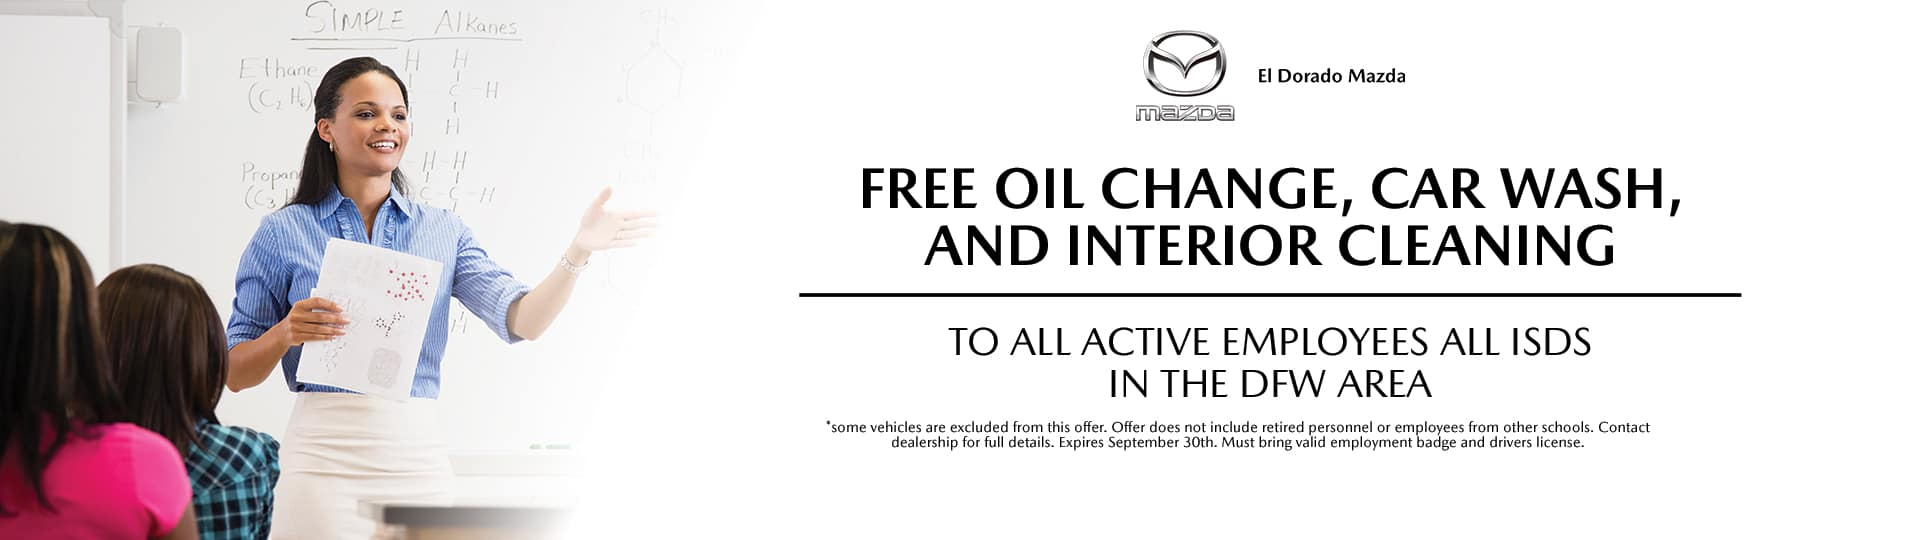 Free oil change, car wash, and interior cleaning | El Dorado Mazda in McKinney, Texas